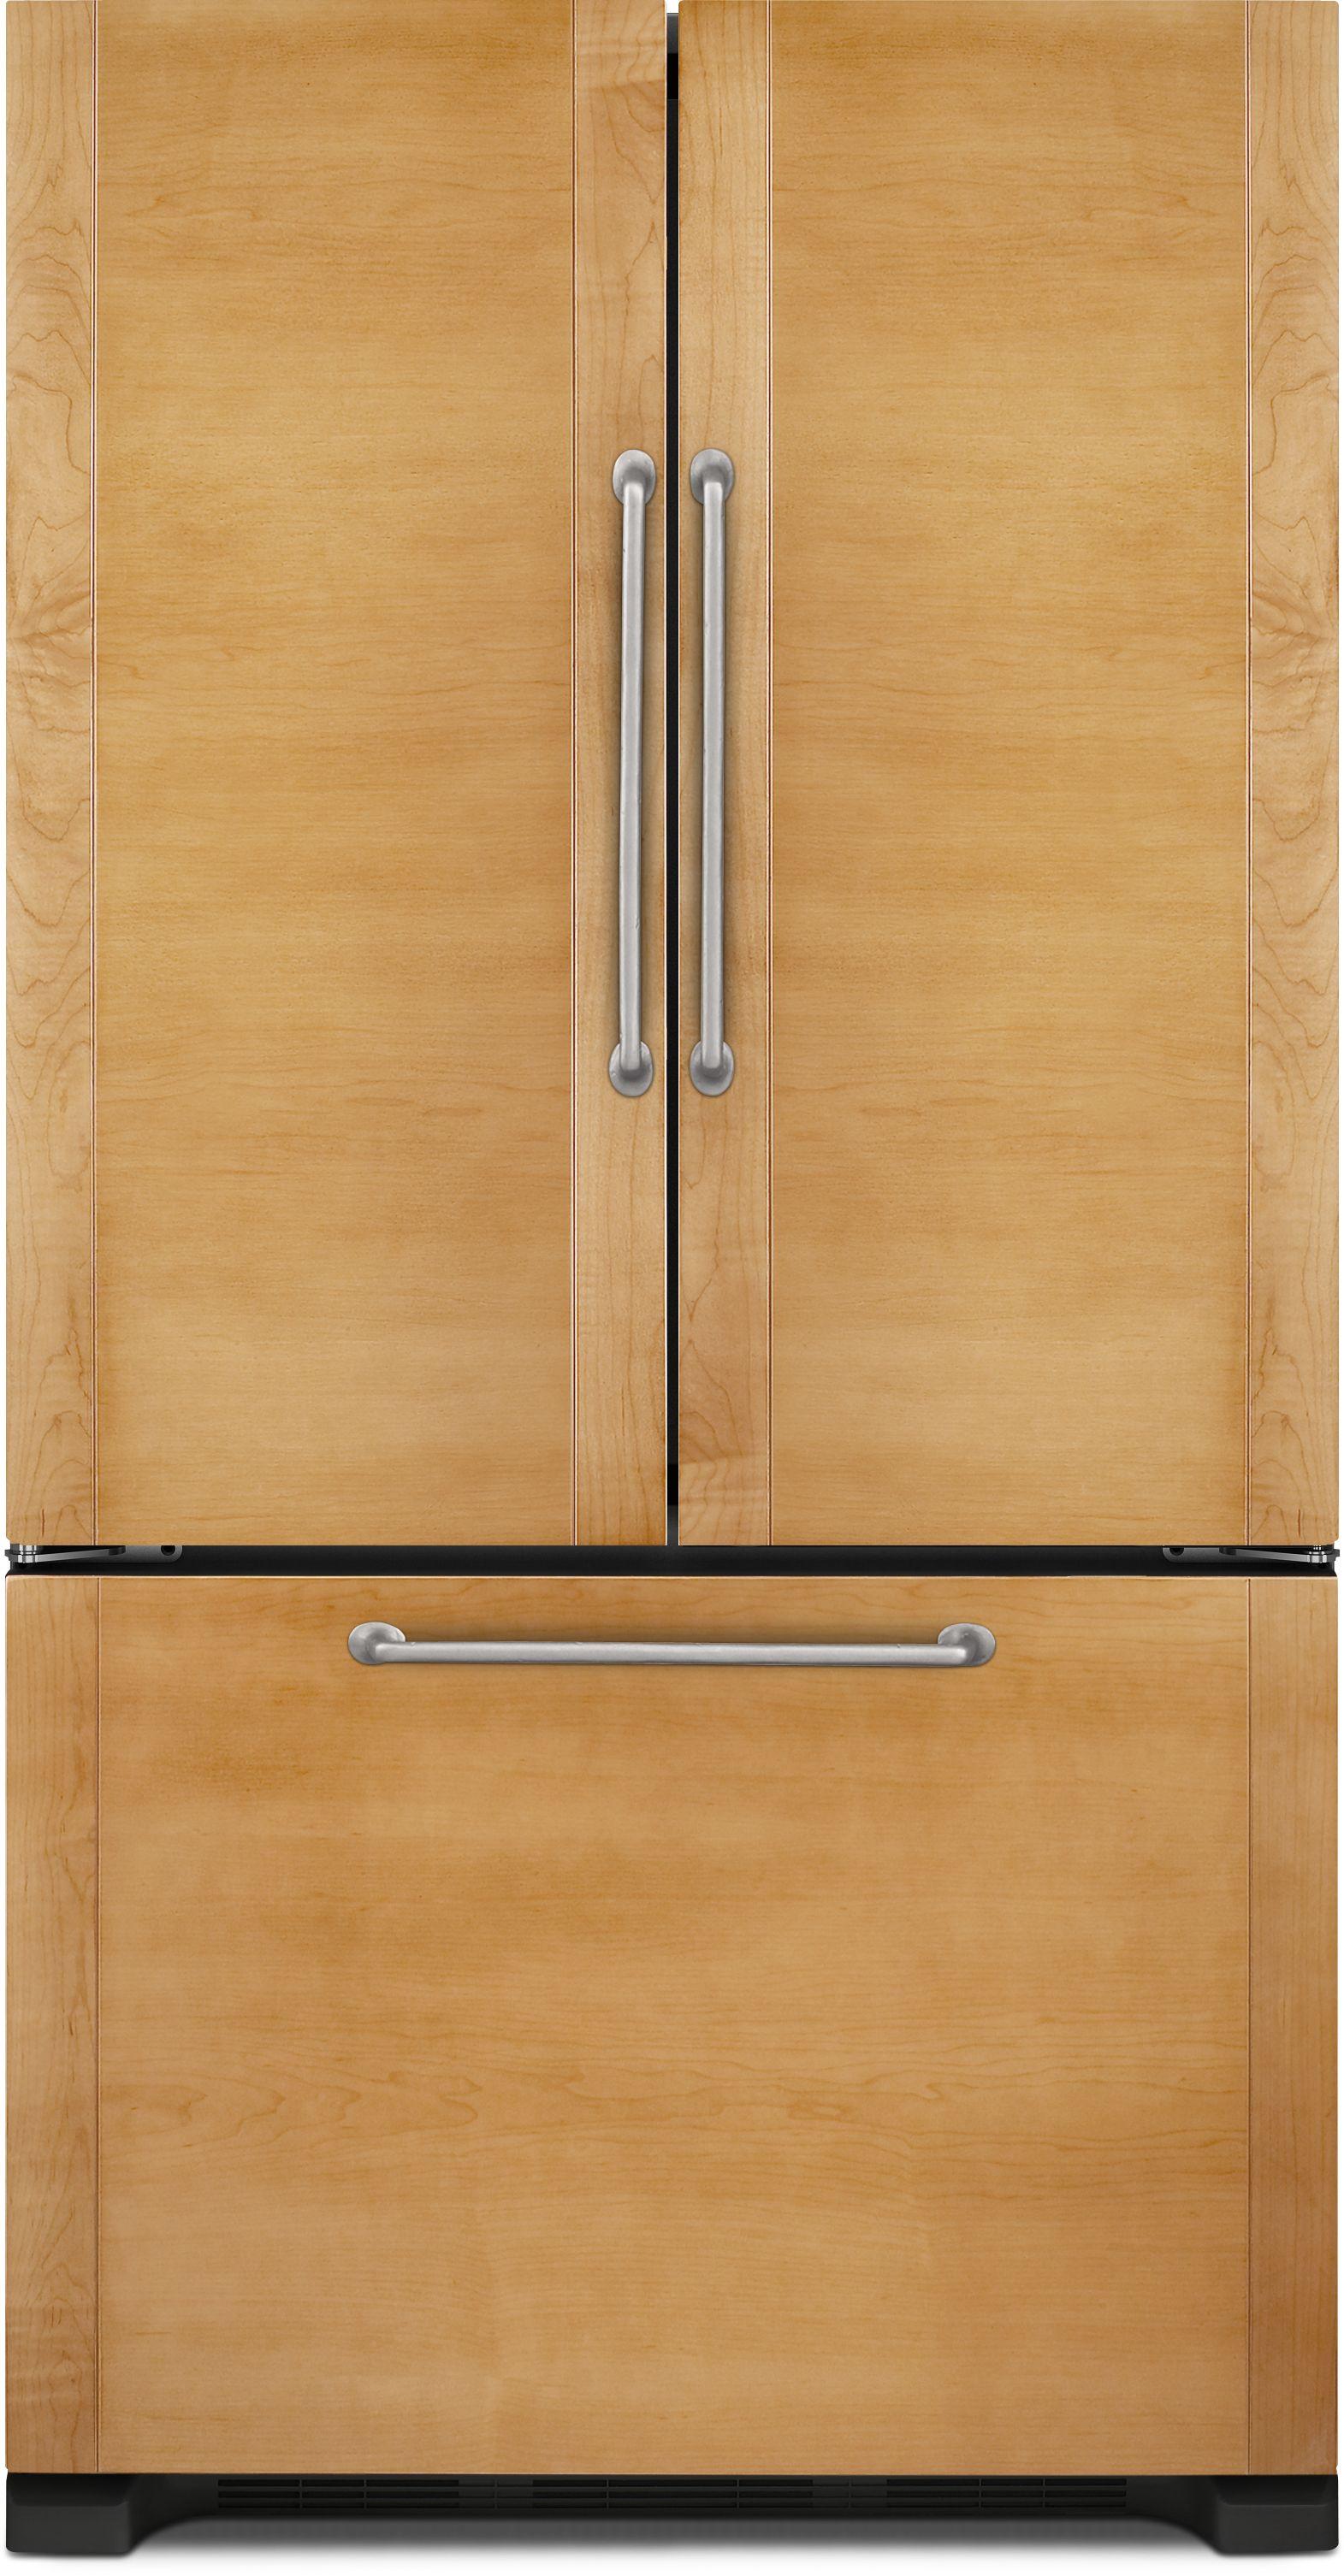 Jenn Air® 21.9 Cu. Ft. Counter Depth French Door Refrigerator Panel